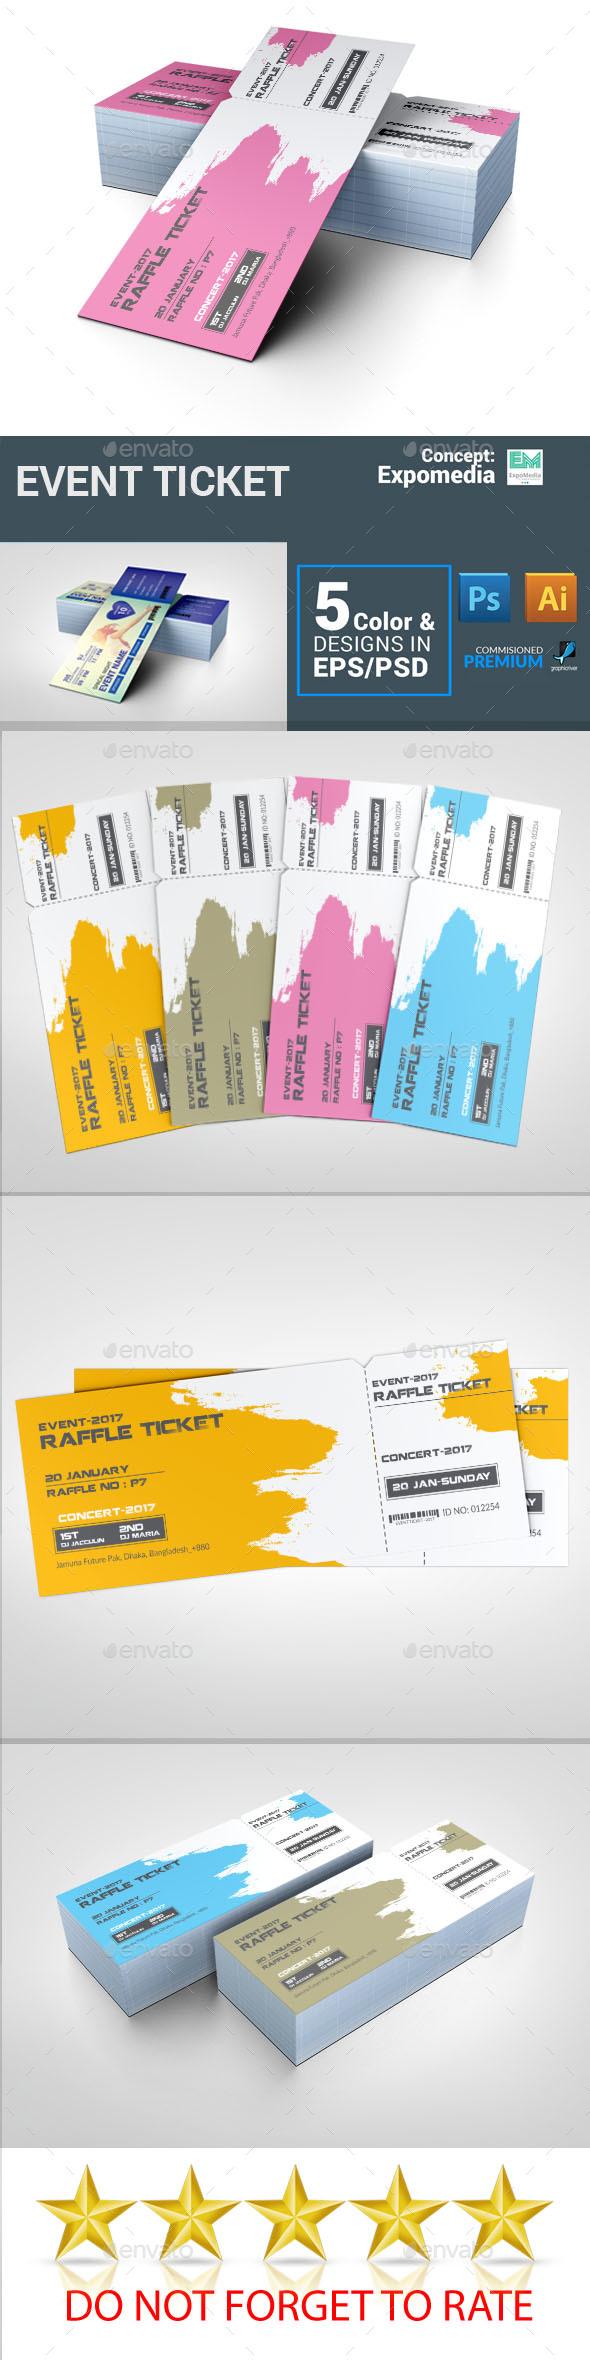 raffle ticket photoshop psd ticket template illustrator ticket template ai download